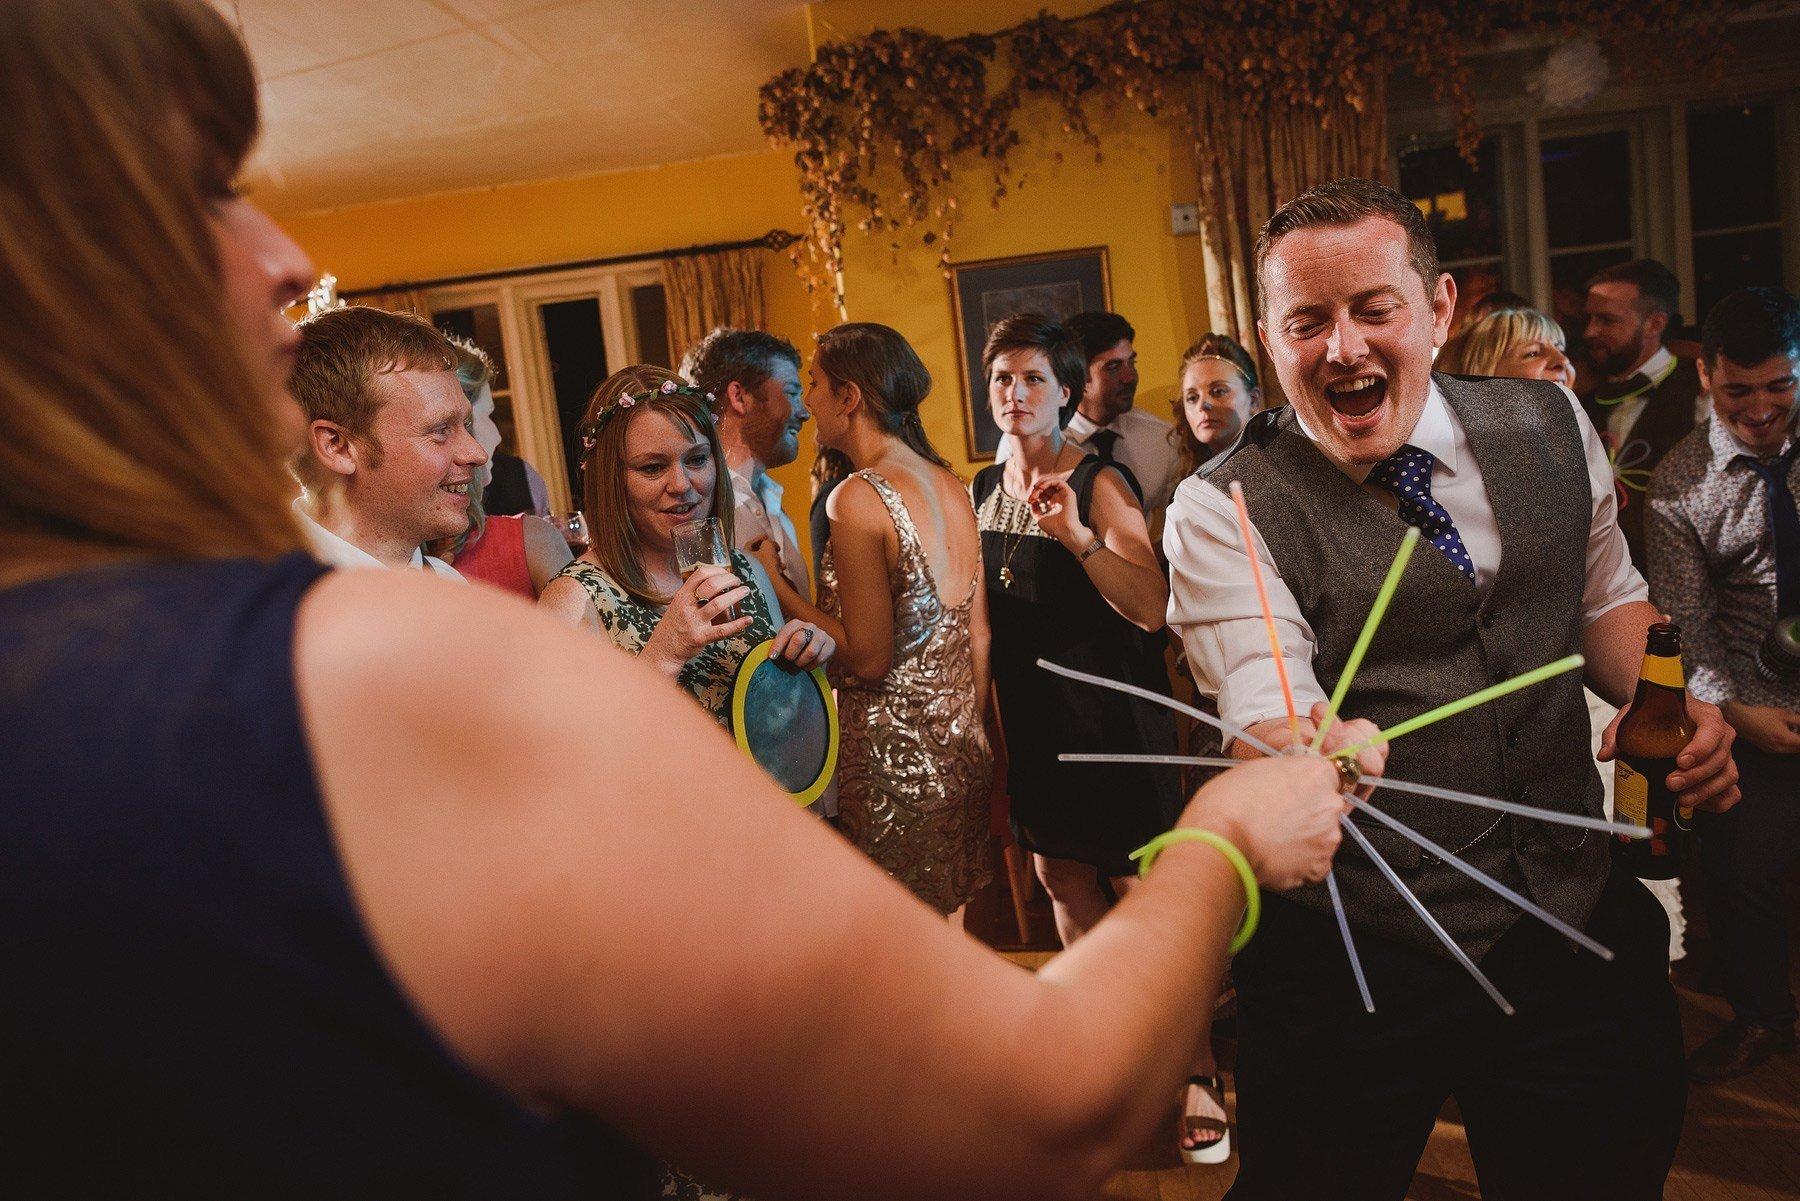 glowsticks on the dancefloor at a wedding